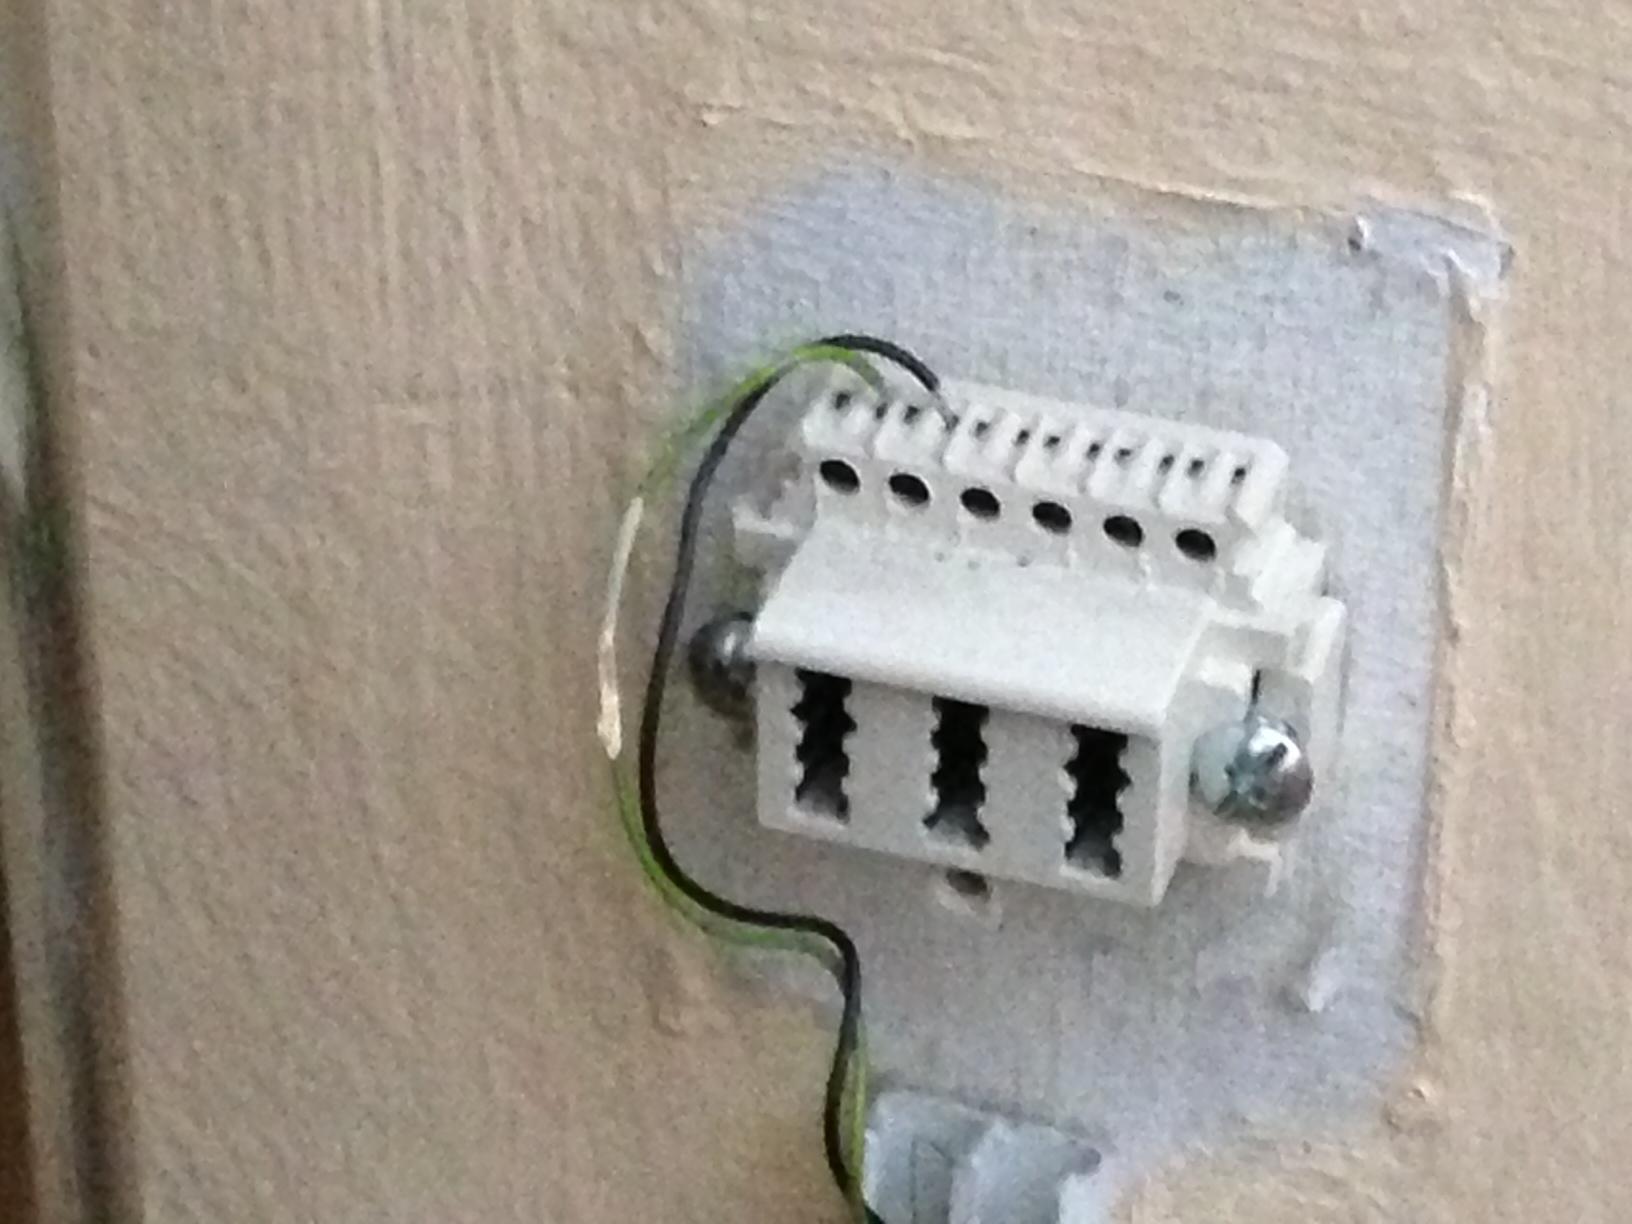 Schlechte DSL Leitung - ADSL2+ als Retter? - Seite 2 ...